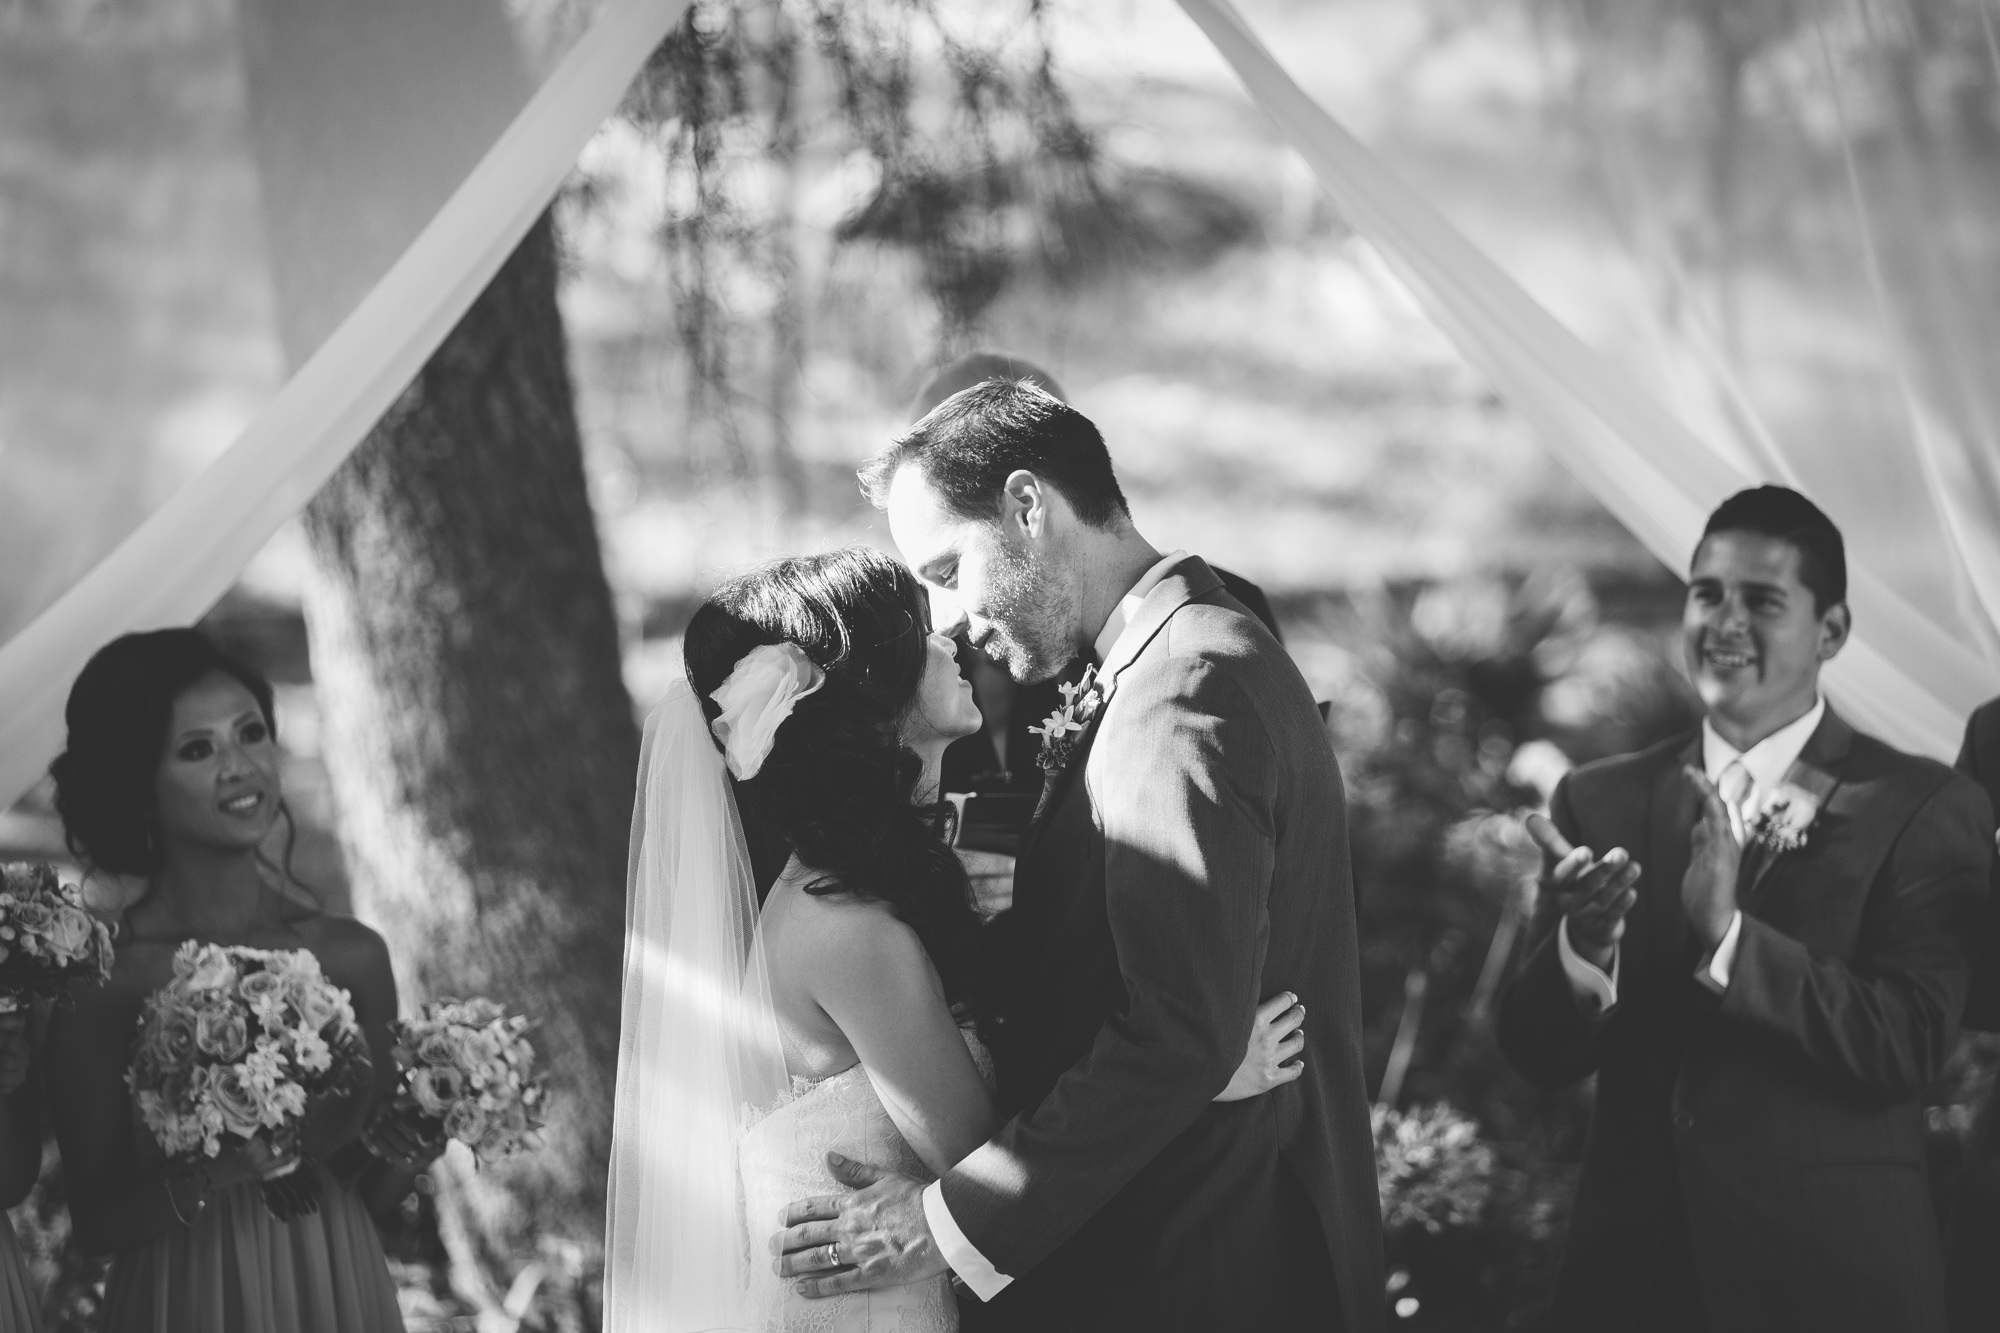 Alice_&_Aaron_Wedding_by_The_Light_&_Glass_Photography-090.jpg